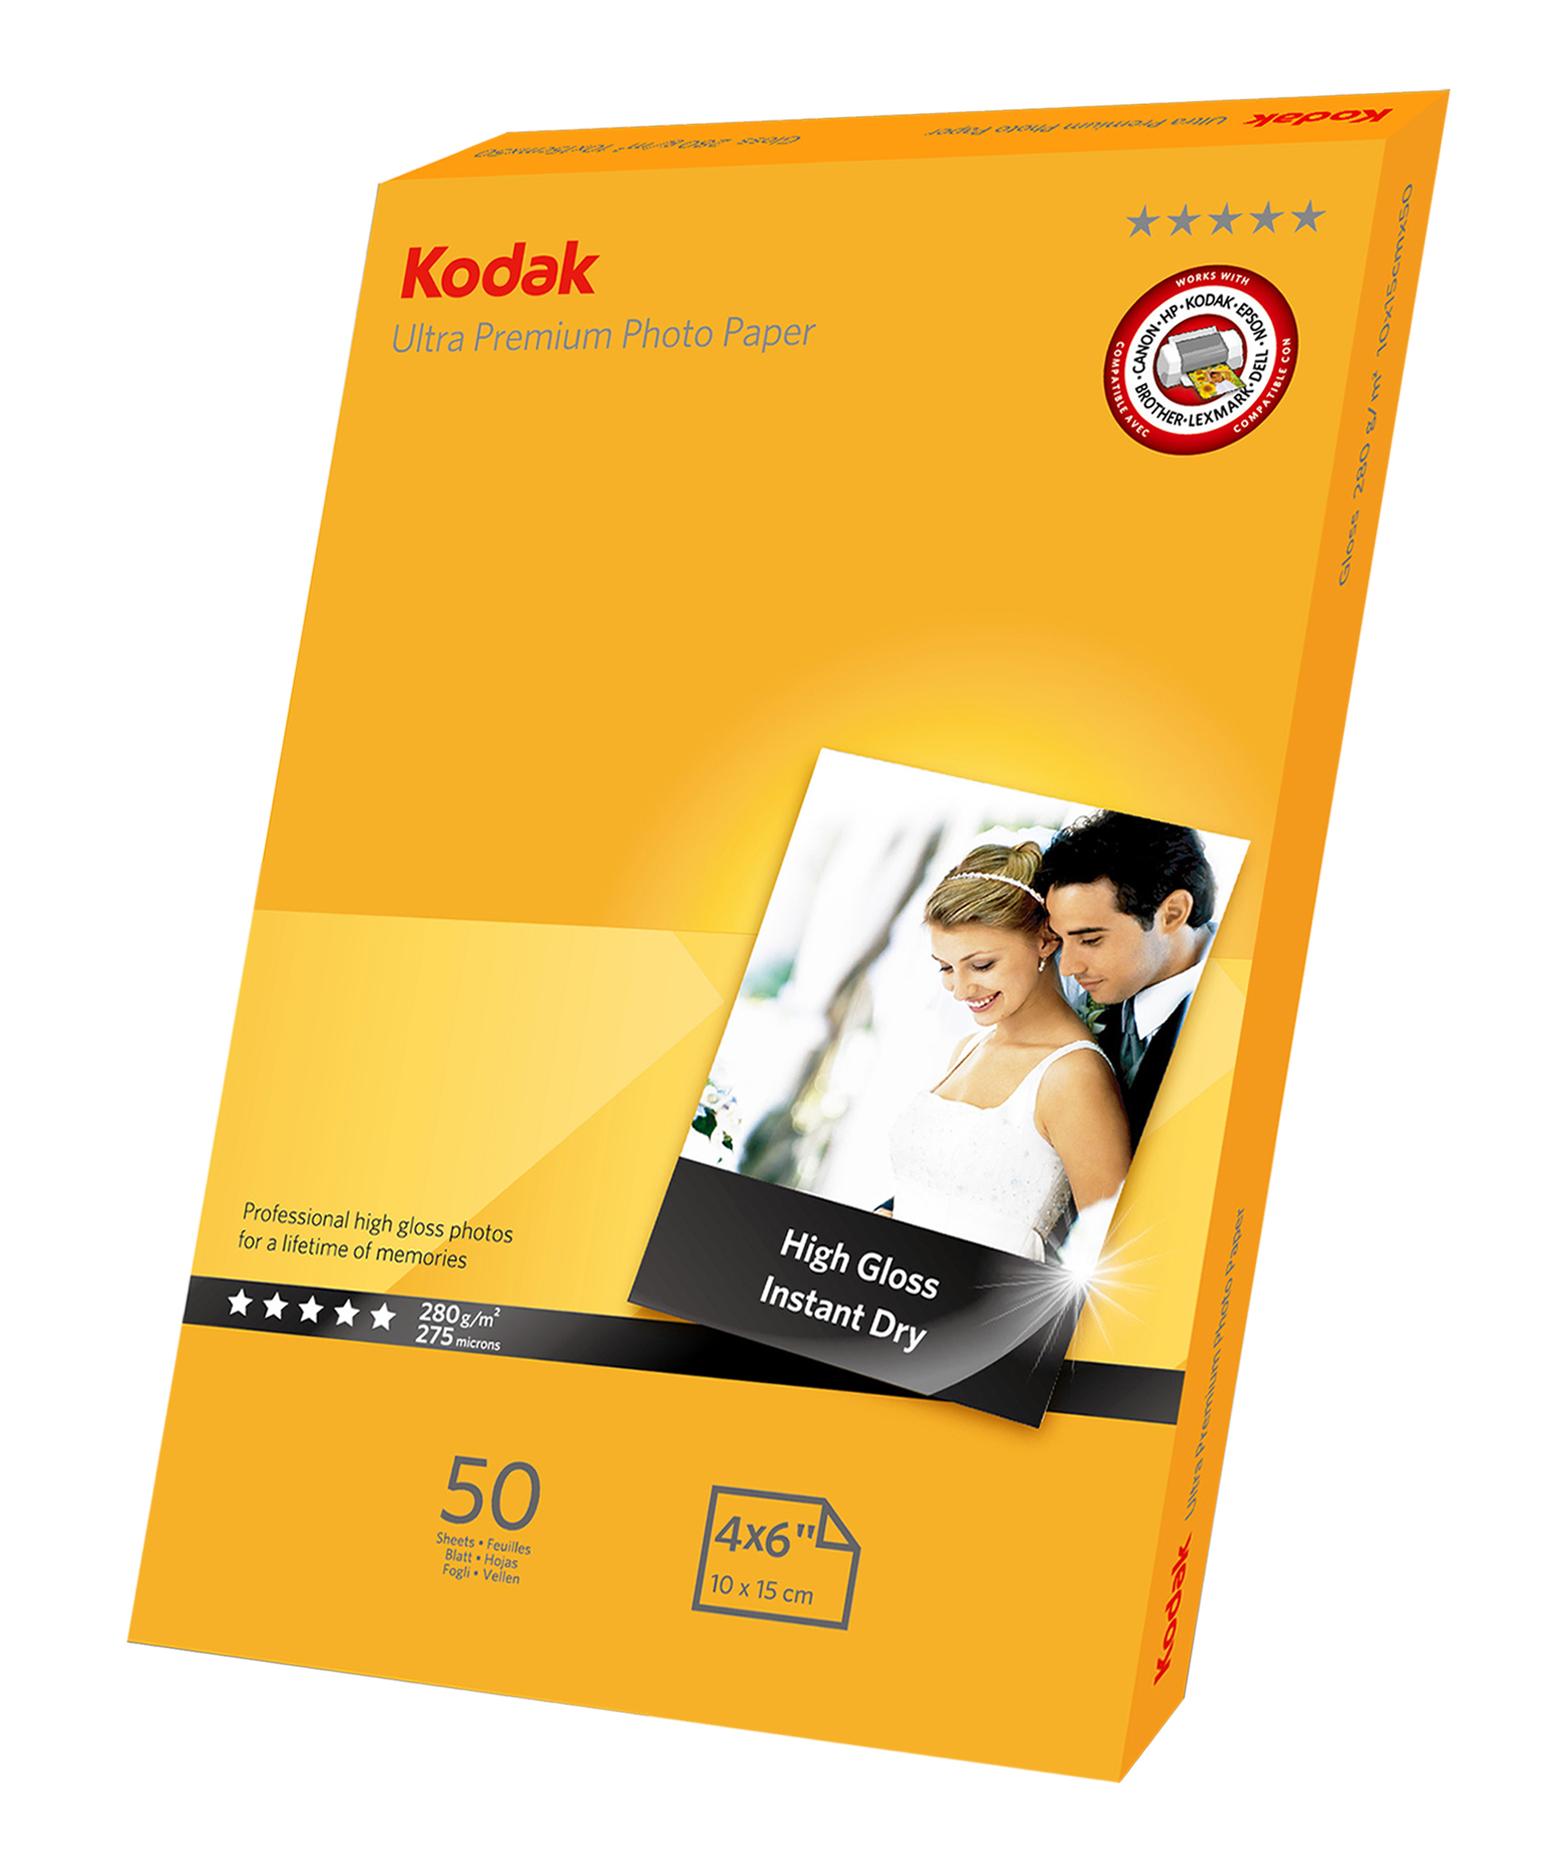 KODAK 10x15 + 13x18 Inkjet Photo Paper